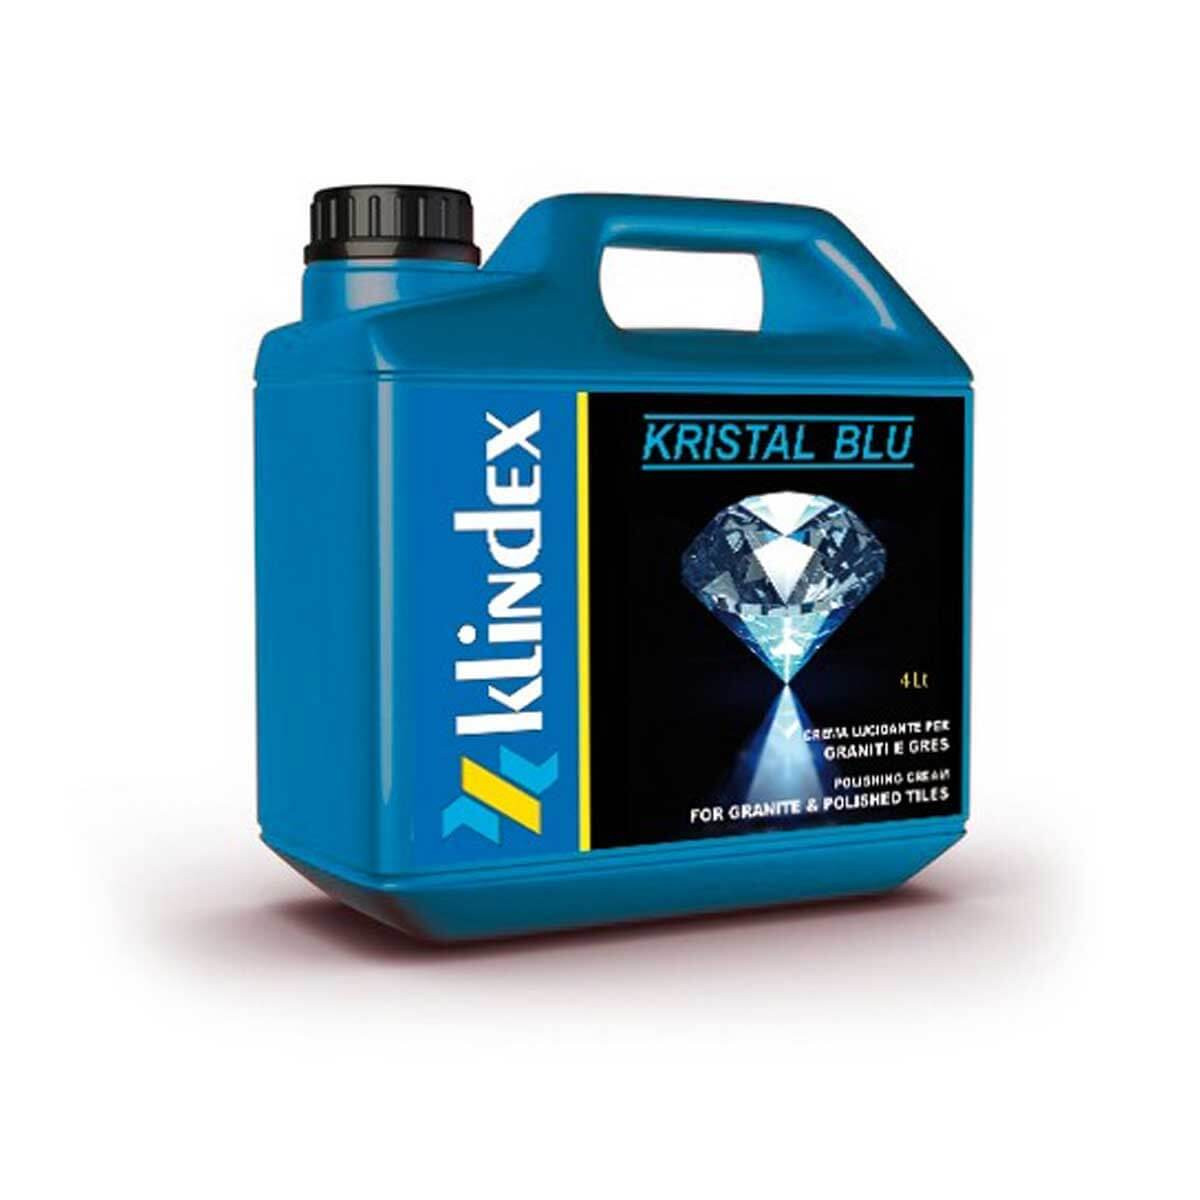 Klindex Kristal BLU Polishing Cream 04826TA